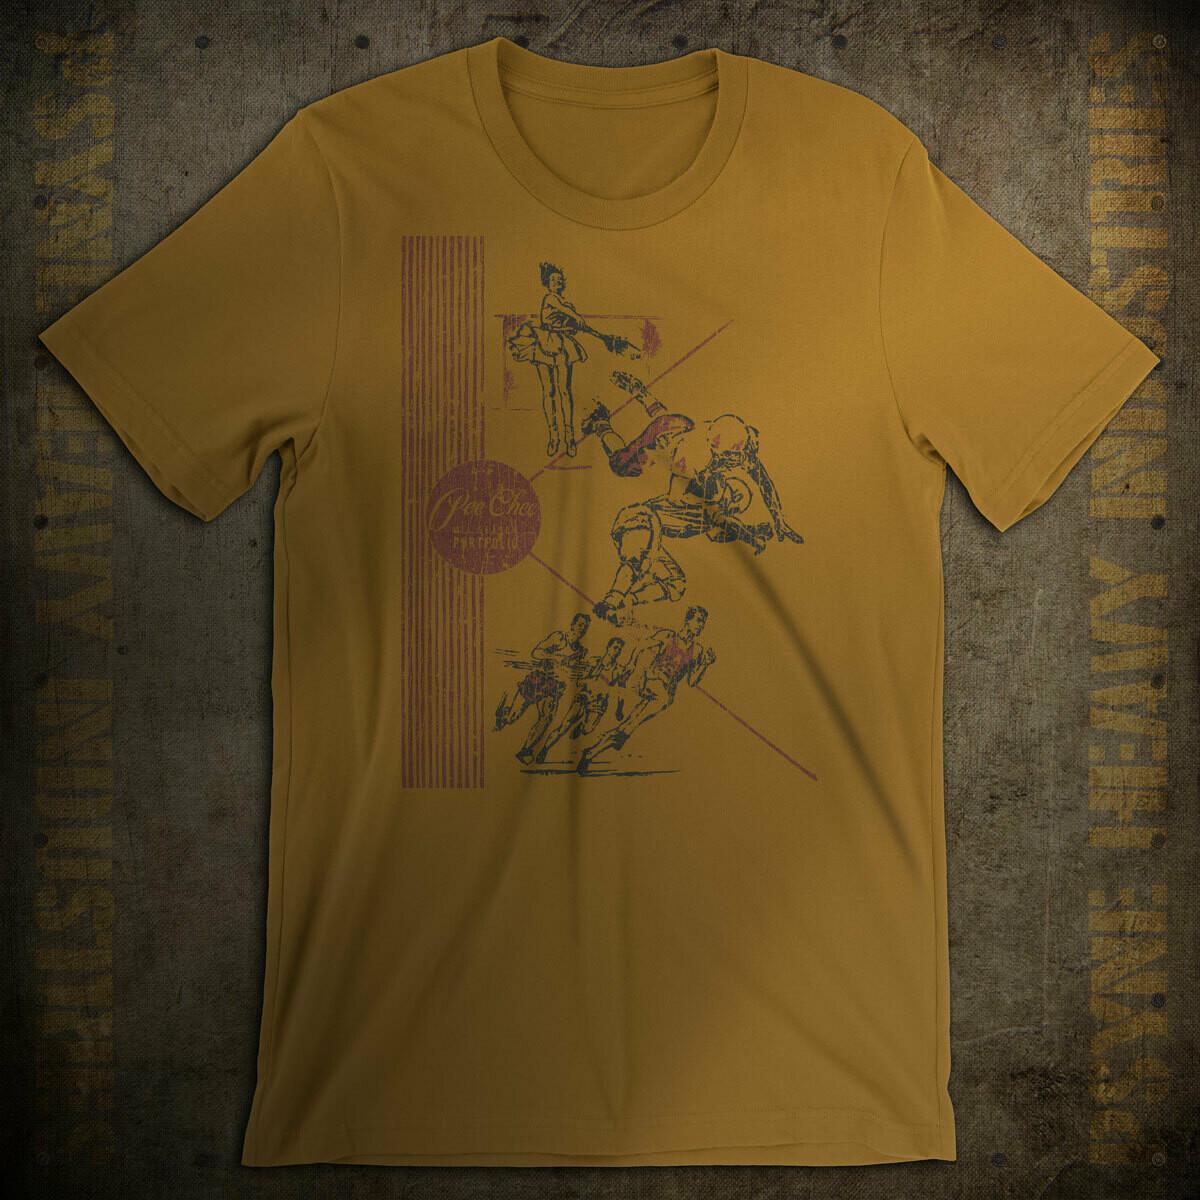 Pee Chee Vintage T-Shirt